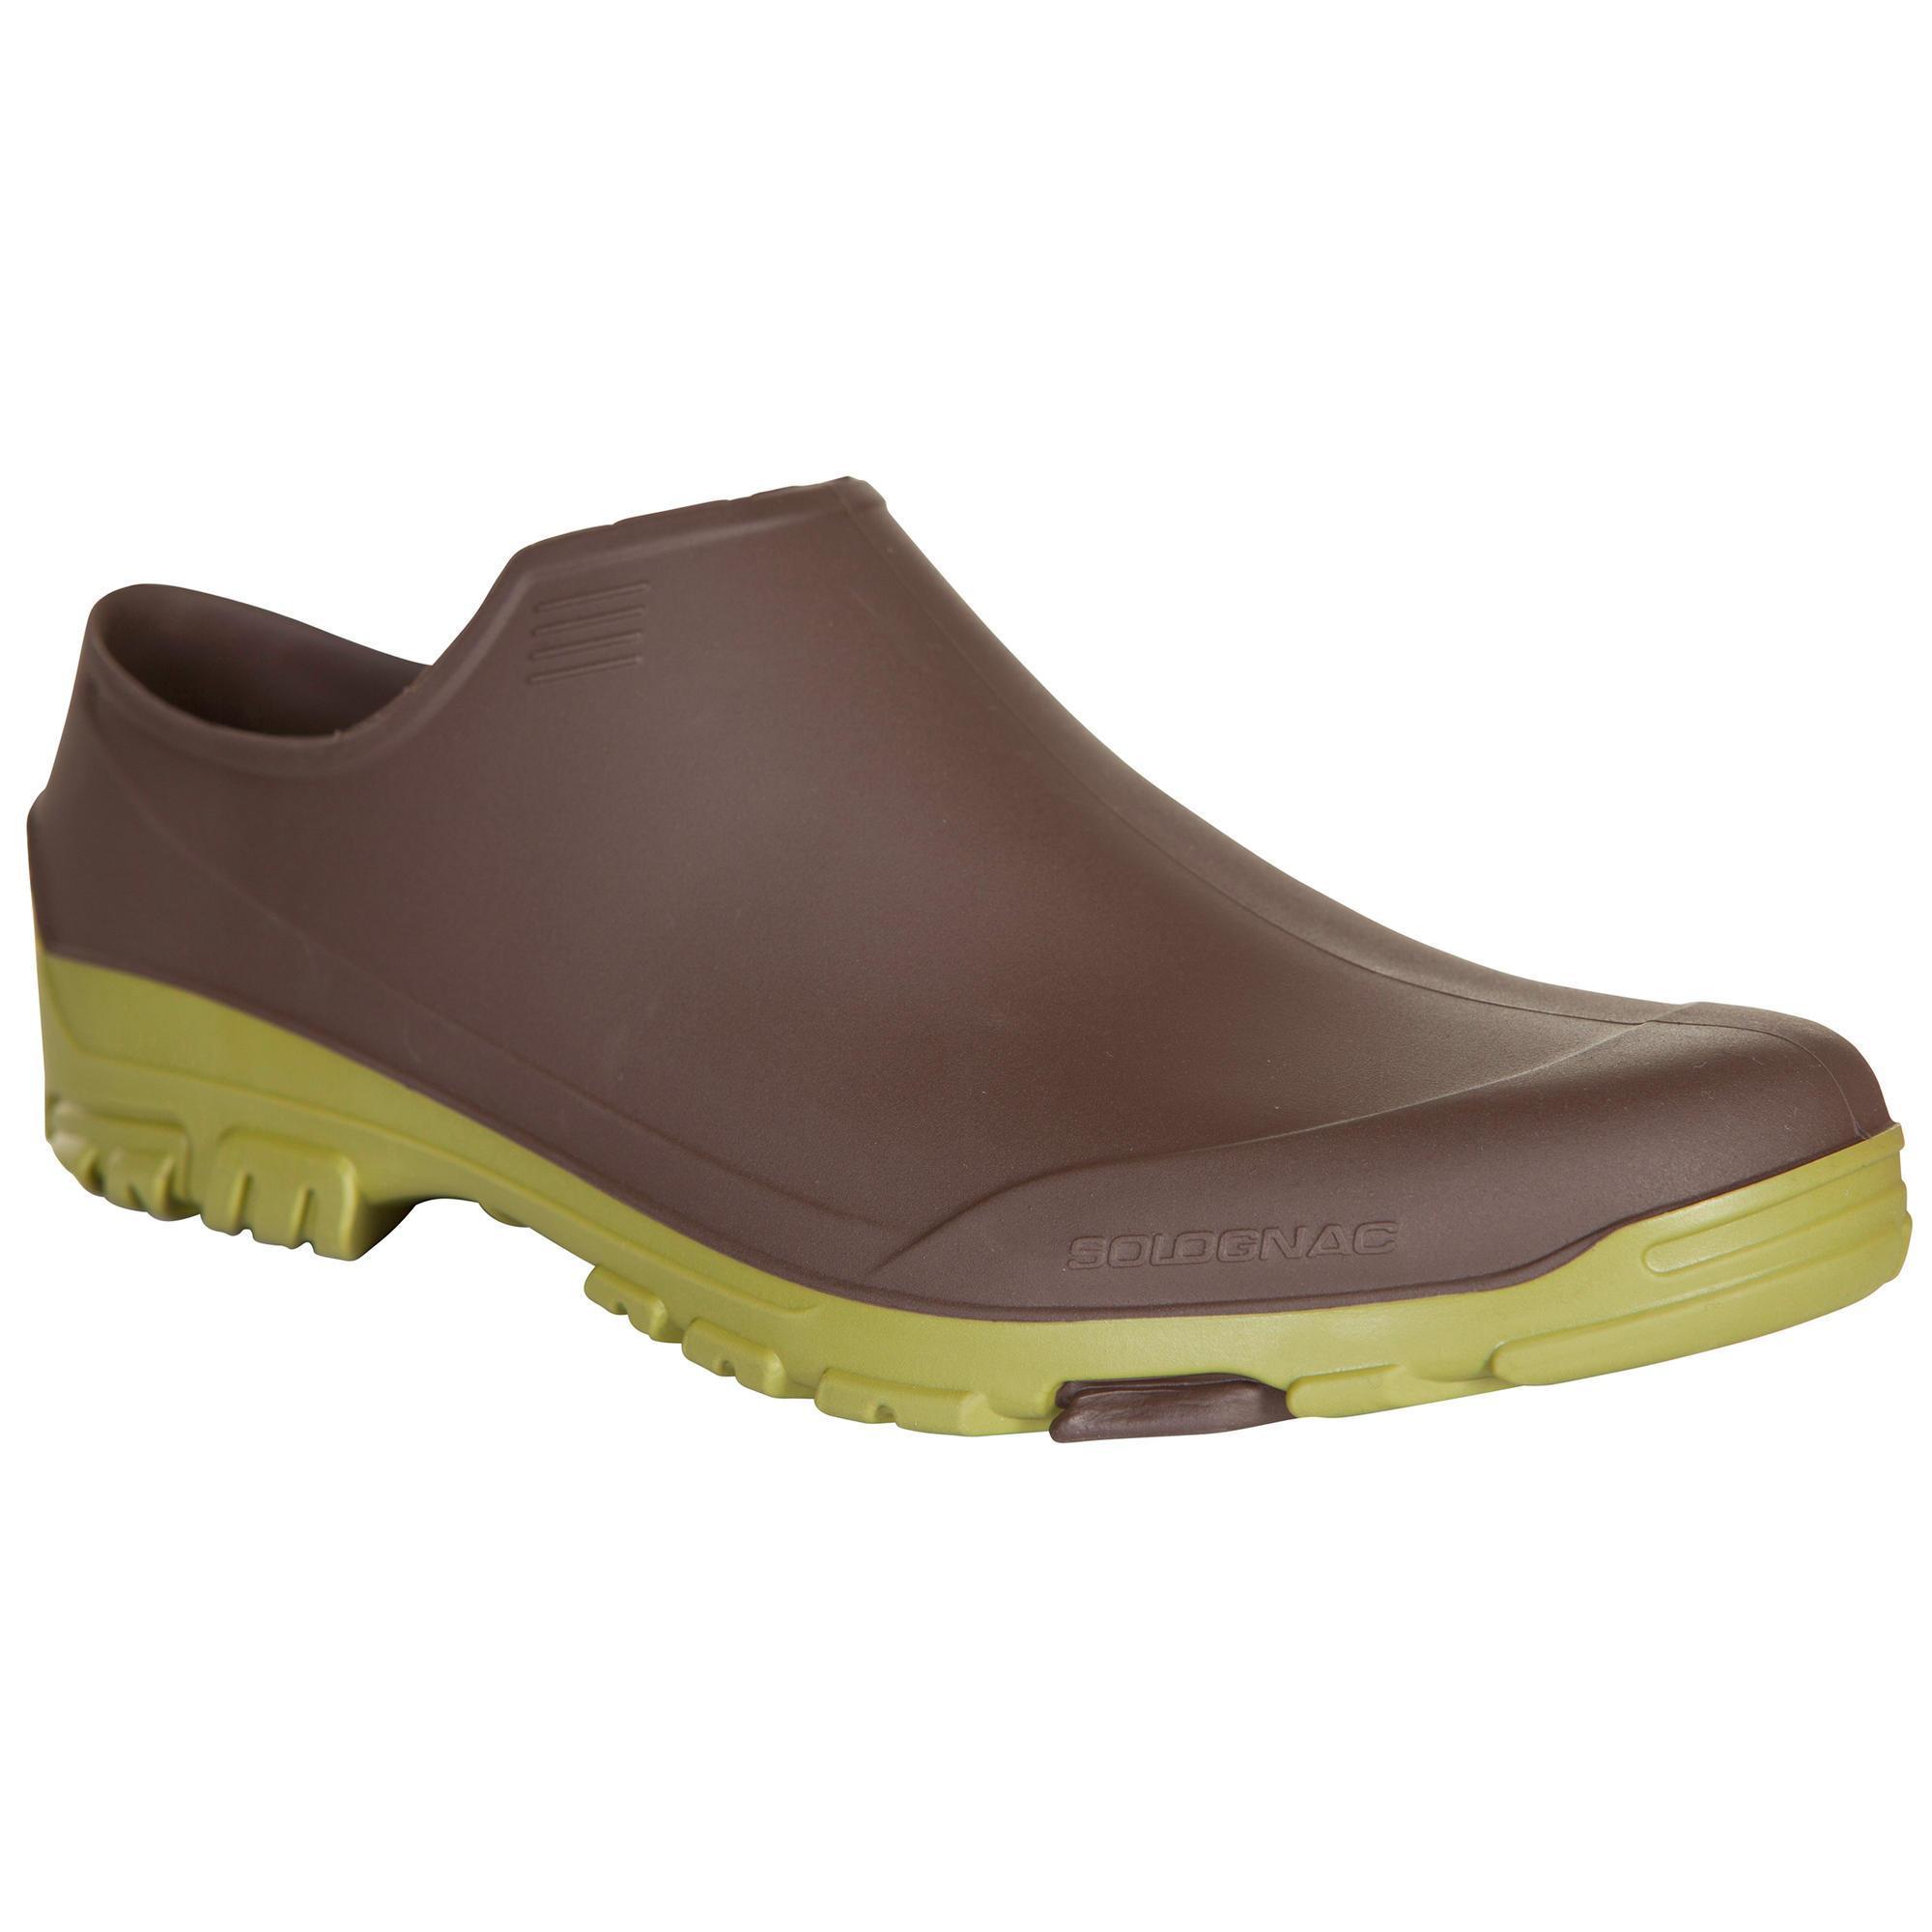 Gummischuhe Inverness 100 braun | Schuhe > Gummistiefel | Solognac